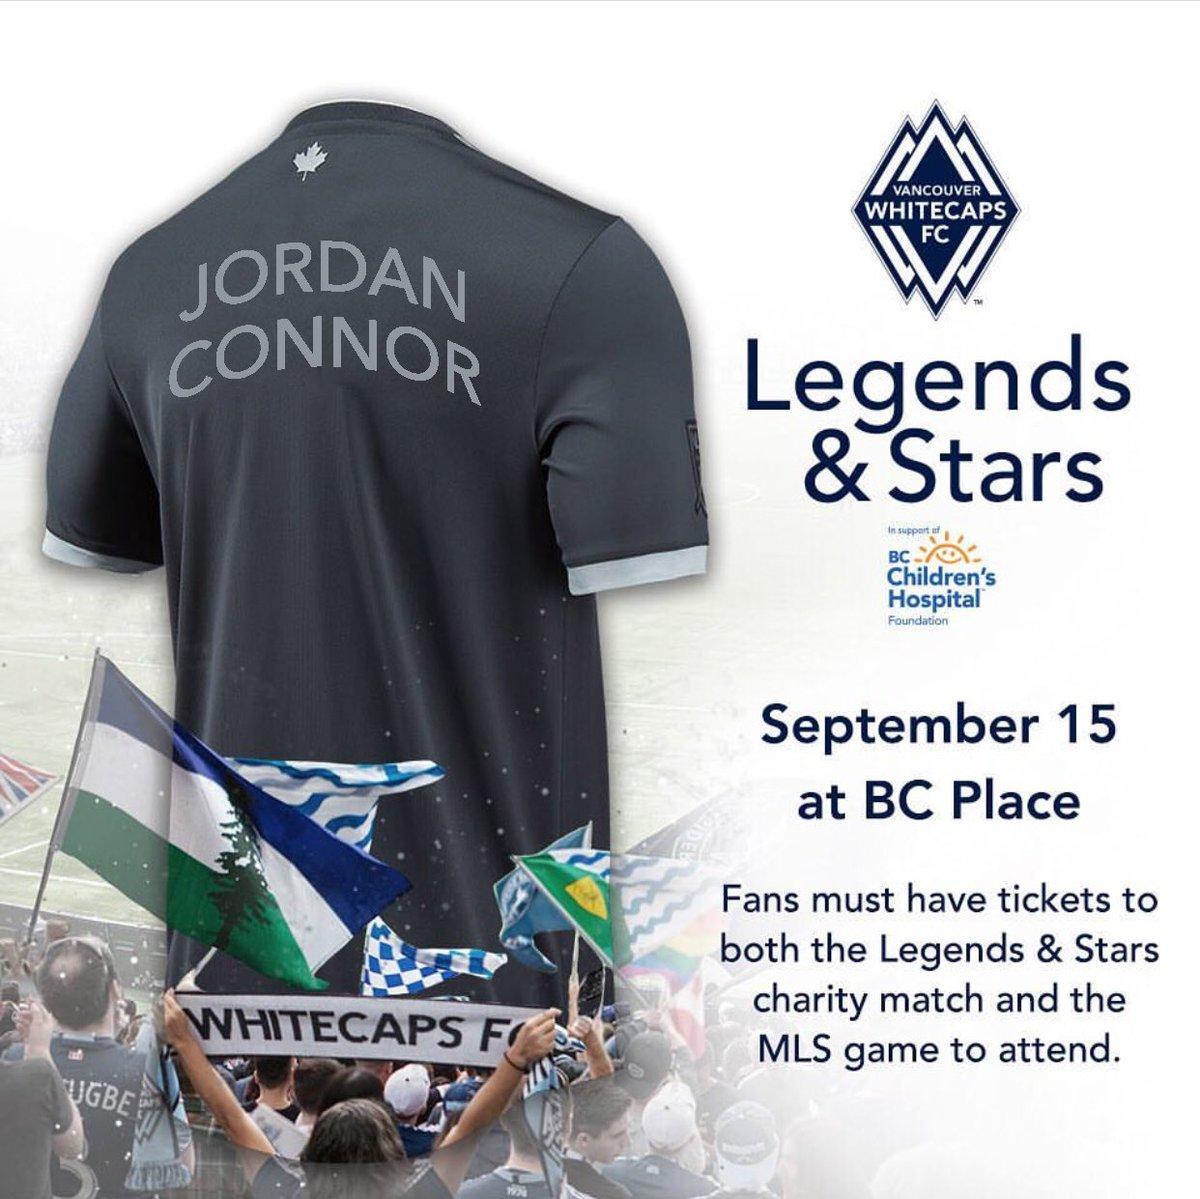 75ff2dcc1b4 Jordan Connor on Twitter: